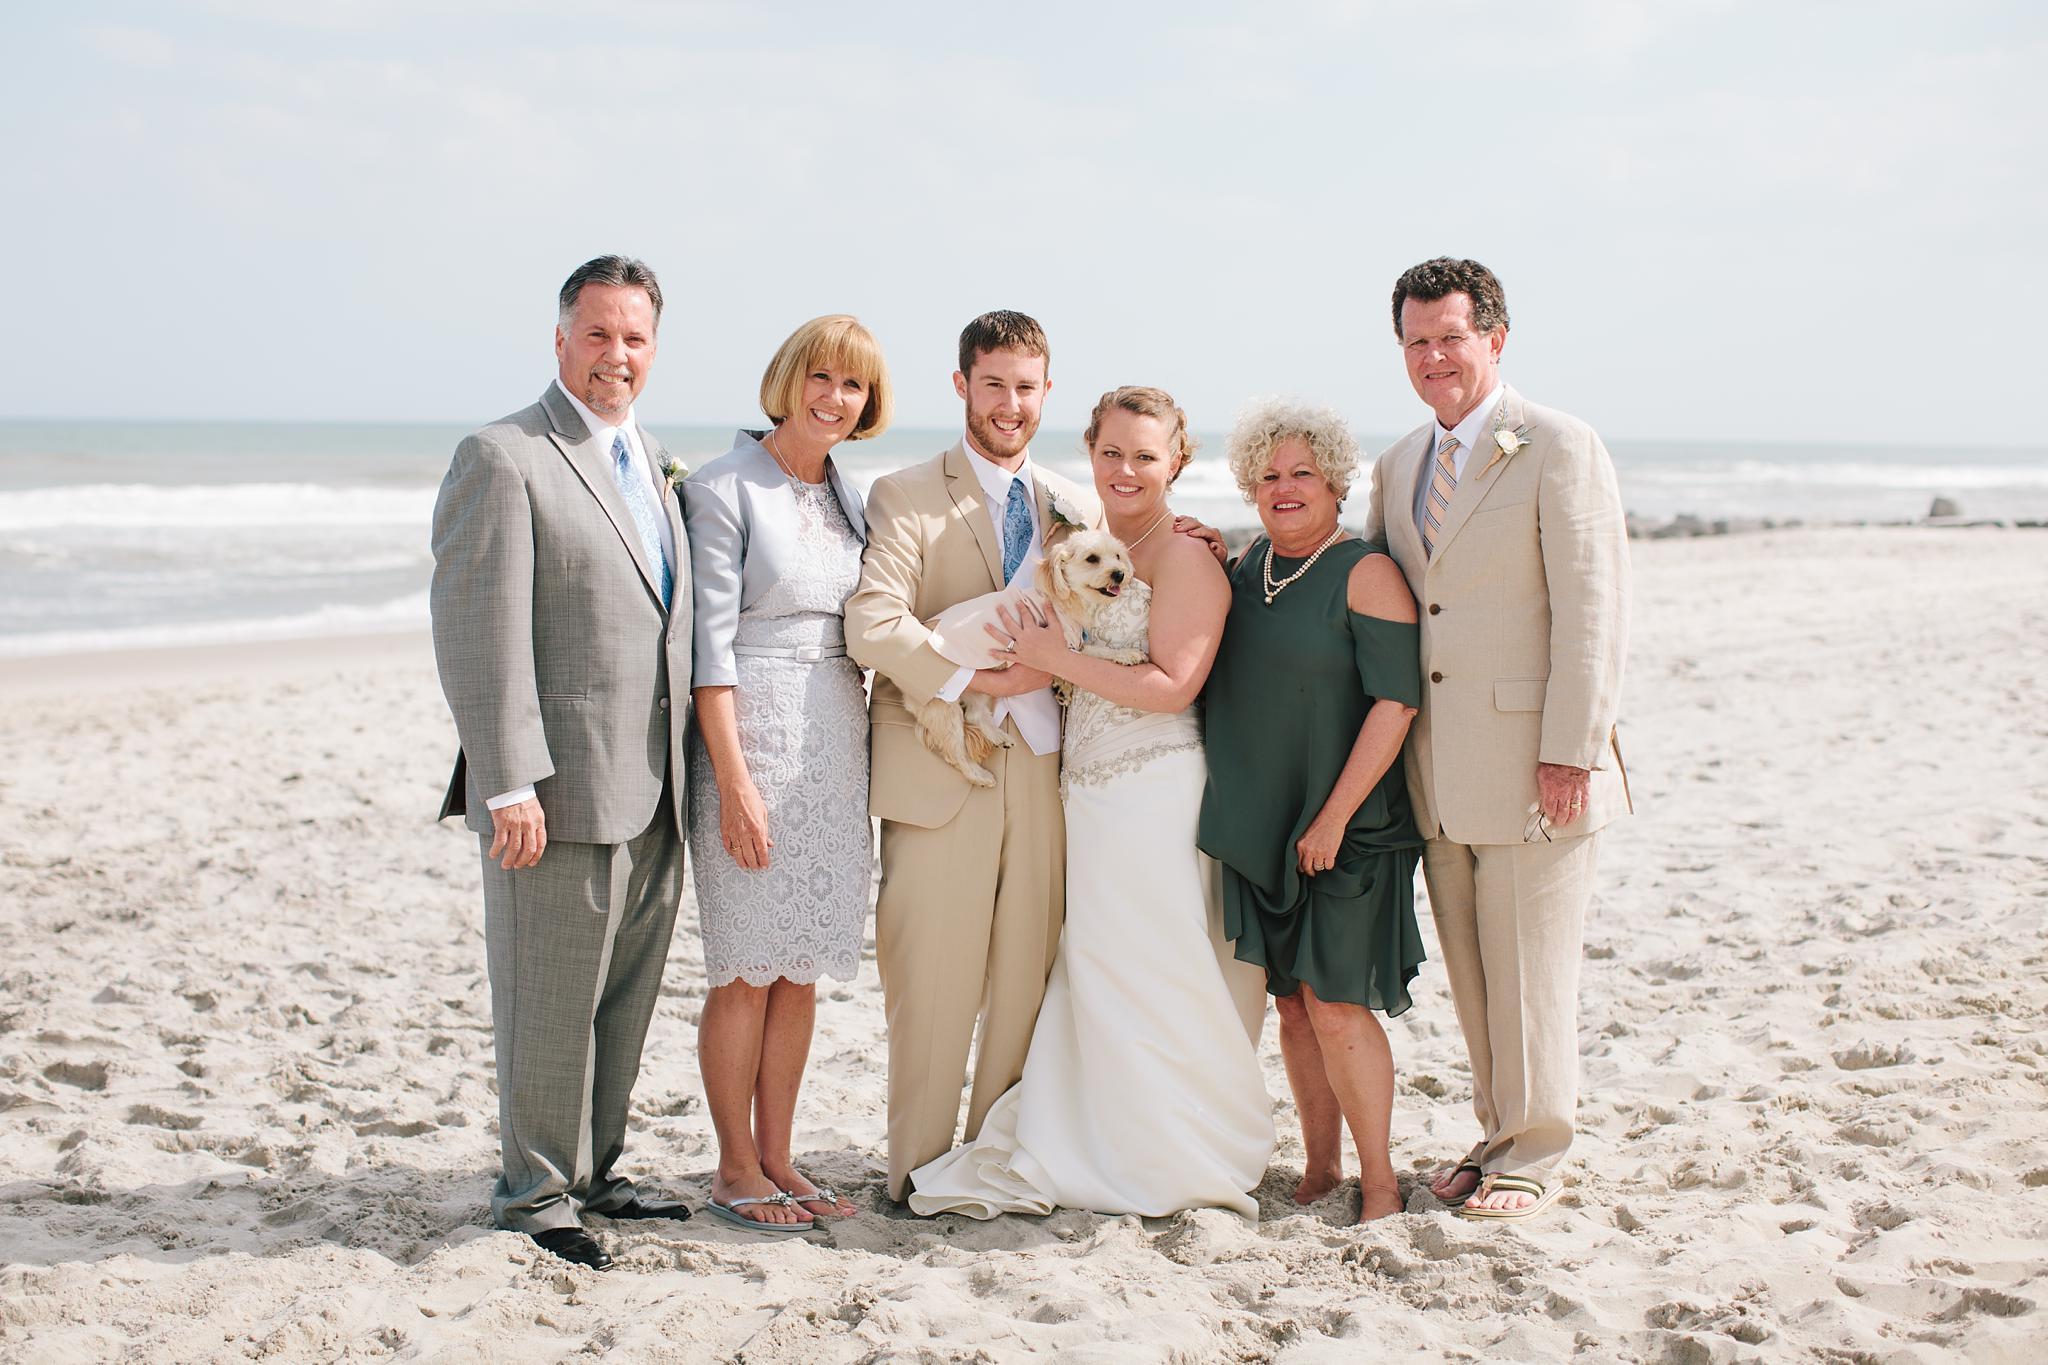 brant_beach_yacht_club_wedding_long_beach_island_nj_wedding_photographer_575.jpg